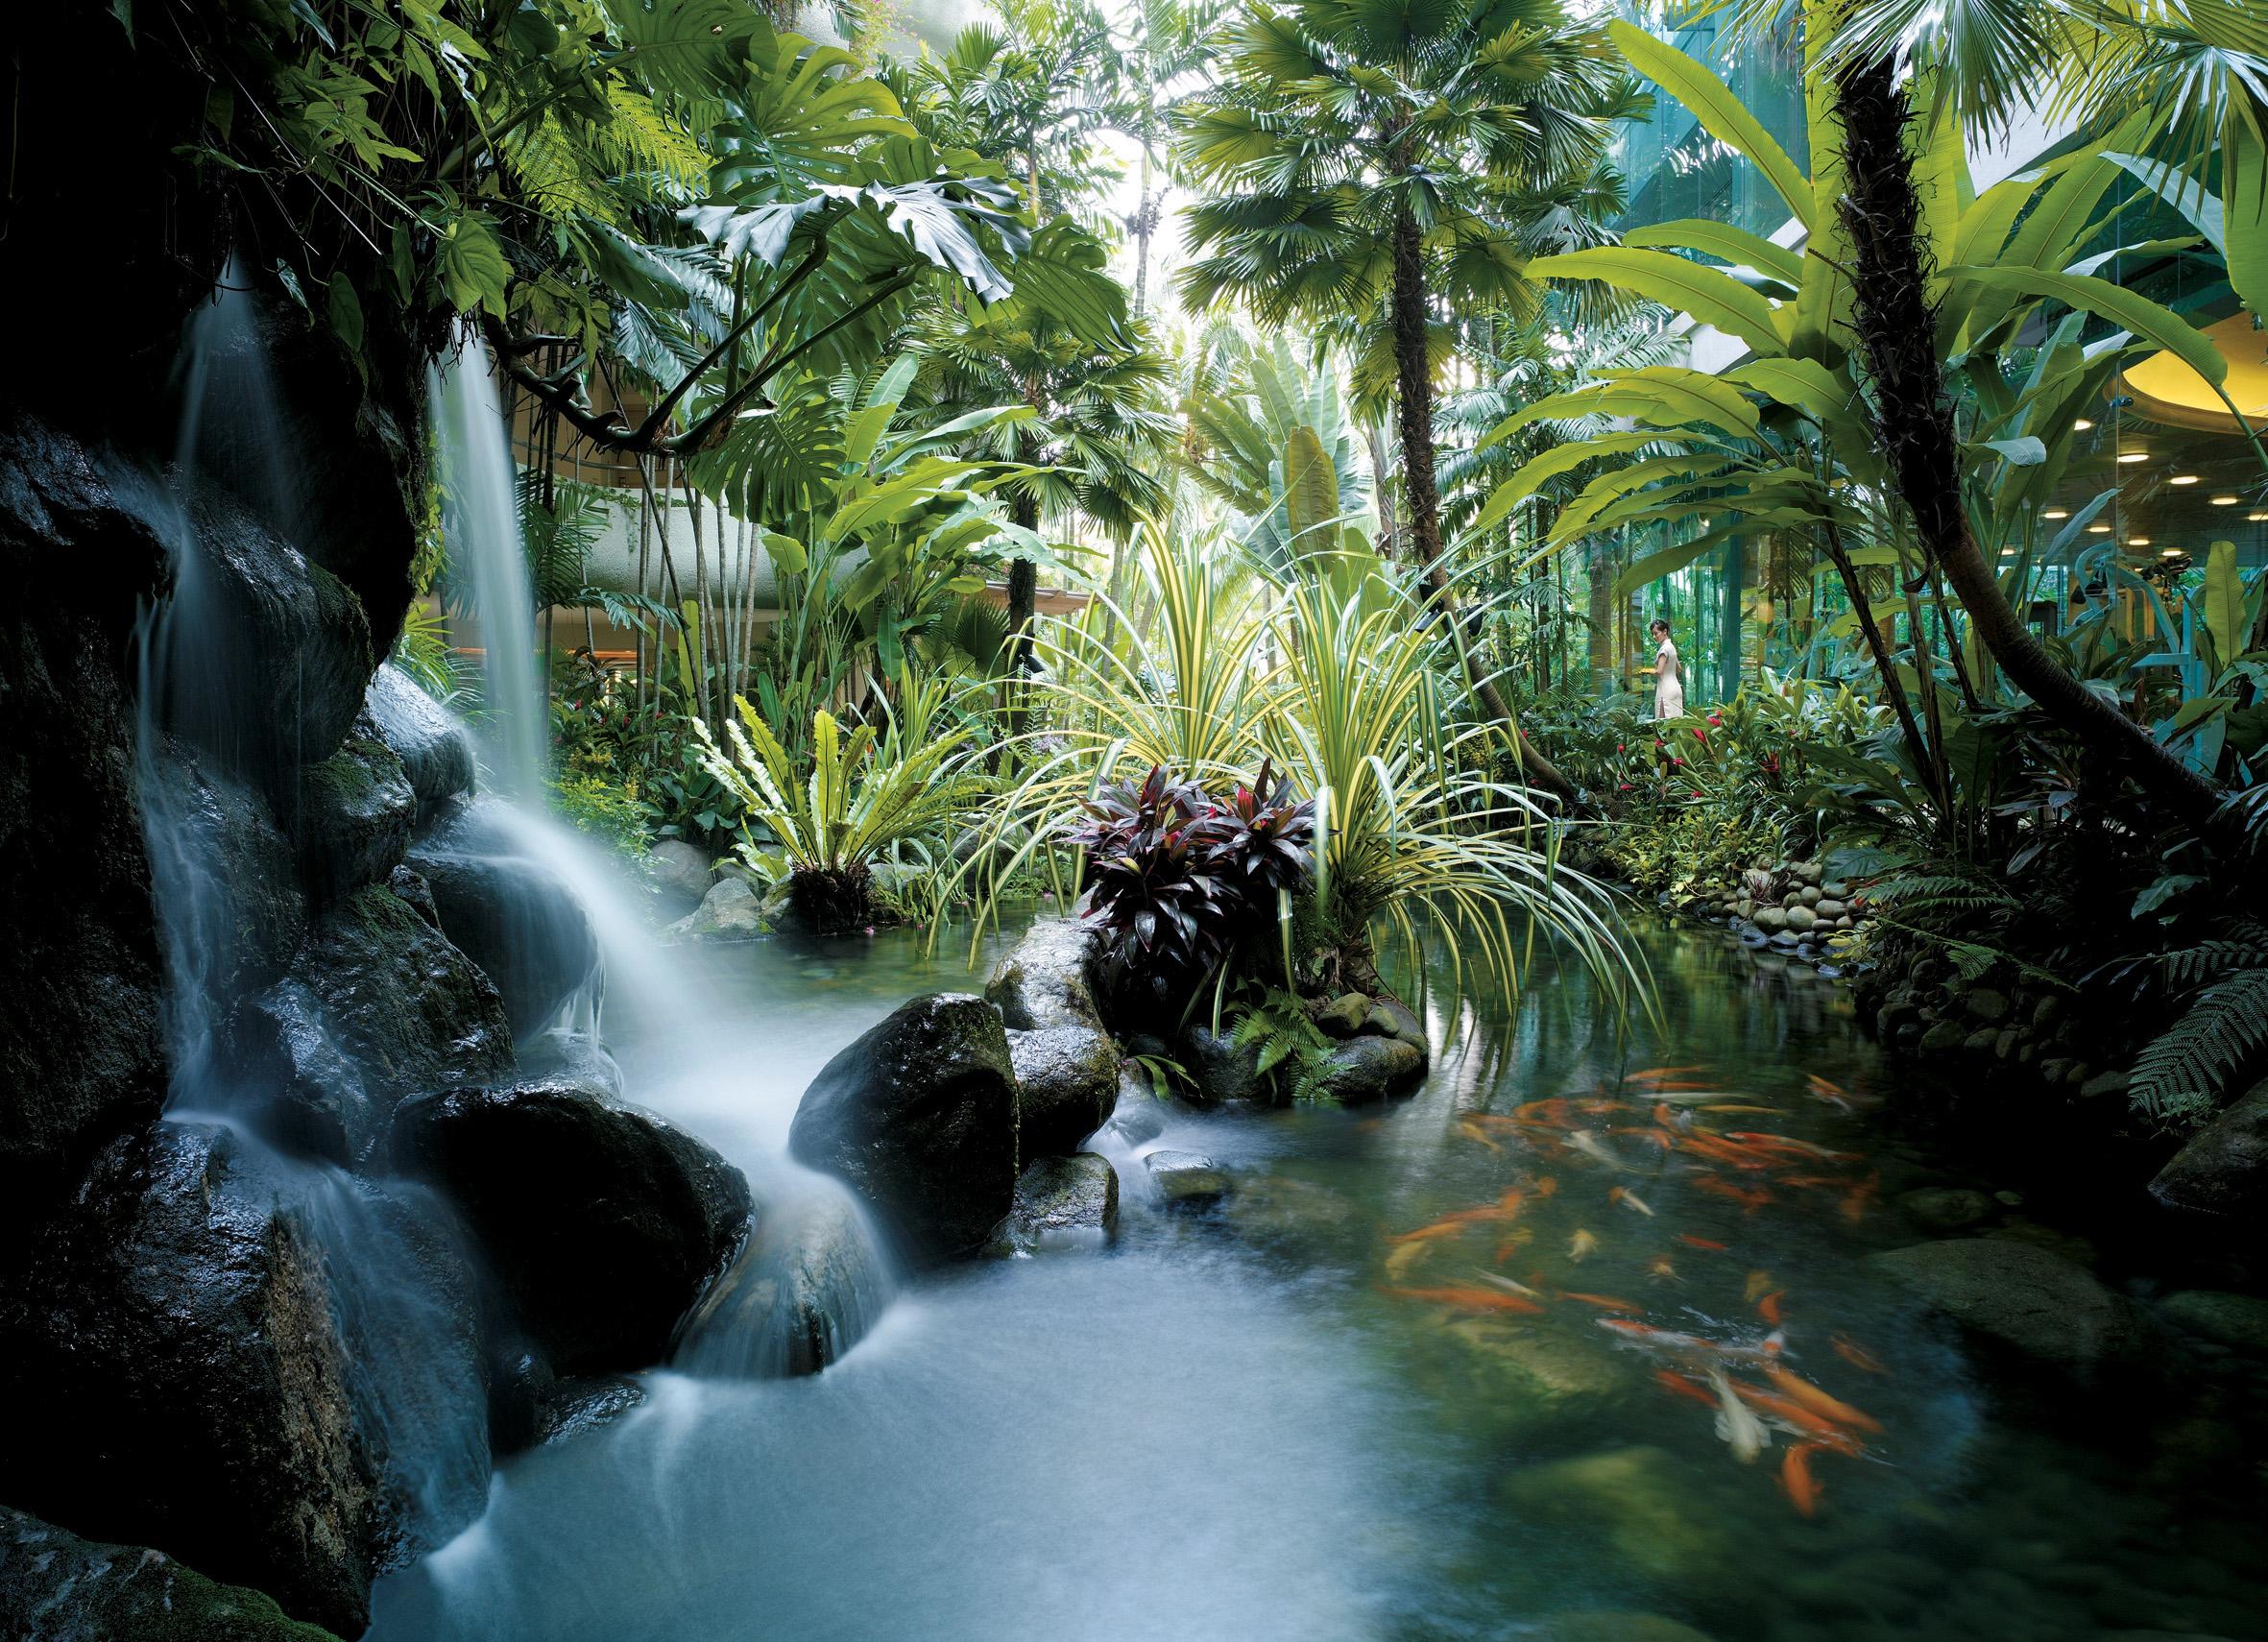 Koi Pond at The Waterfall | Photo Credit: Shangri-La Hotel, Singapore